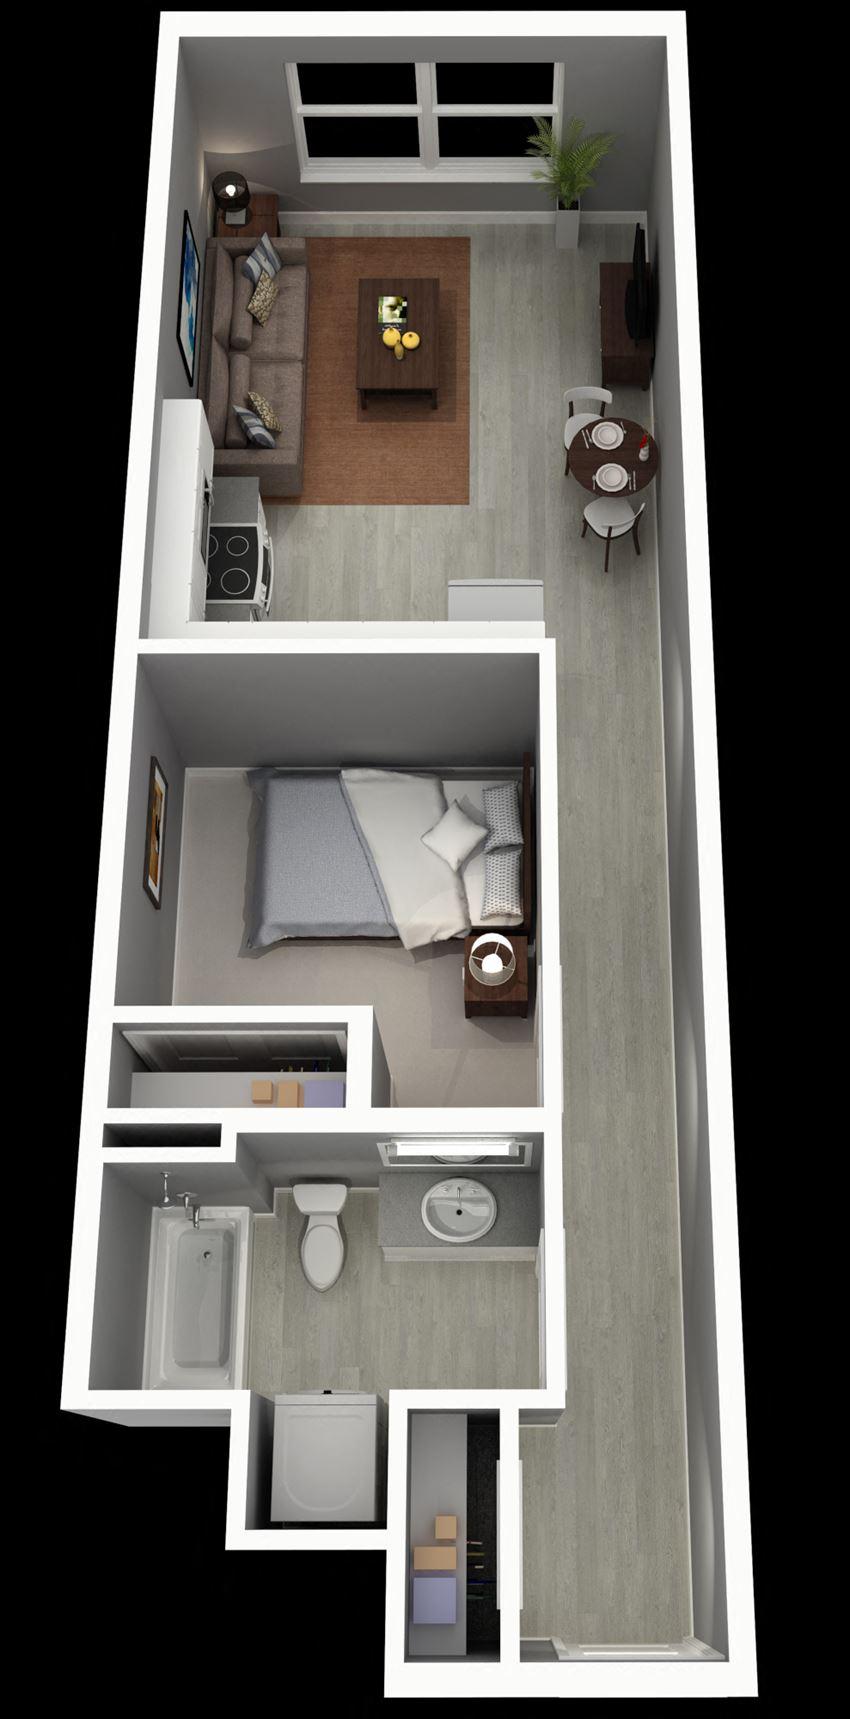 1 Bedroom, 1 Bath - Emerald